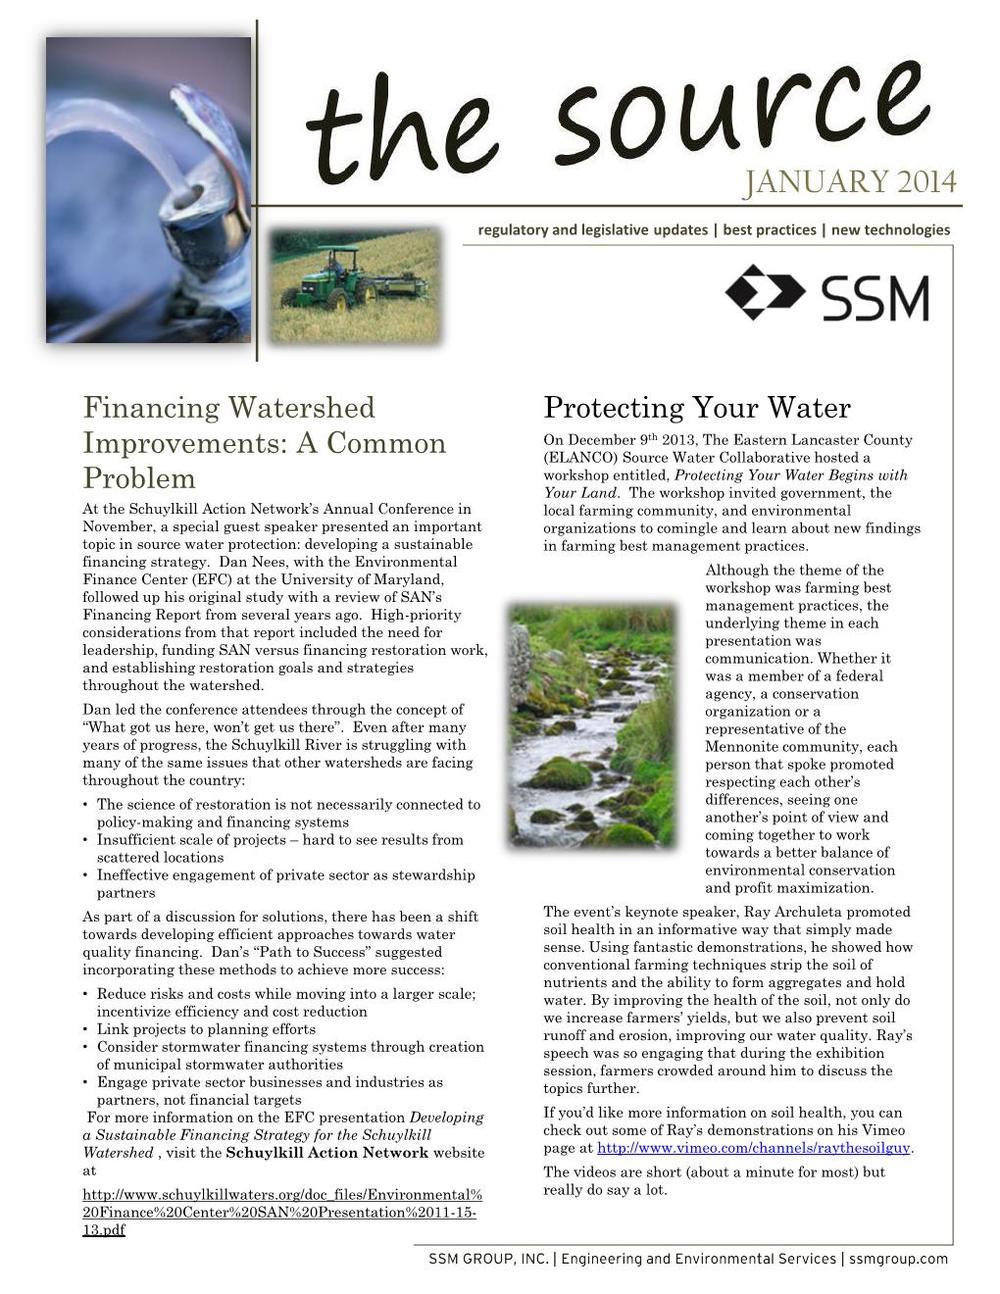 SourceWaterProtection news January 2014